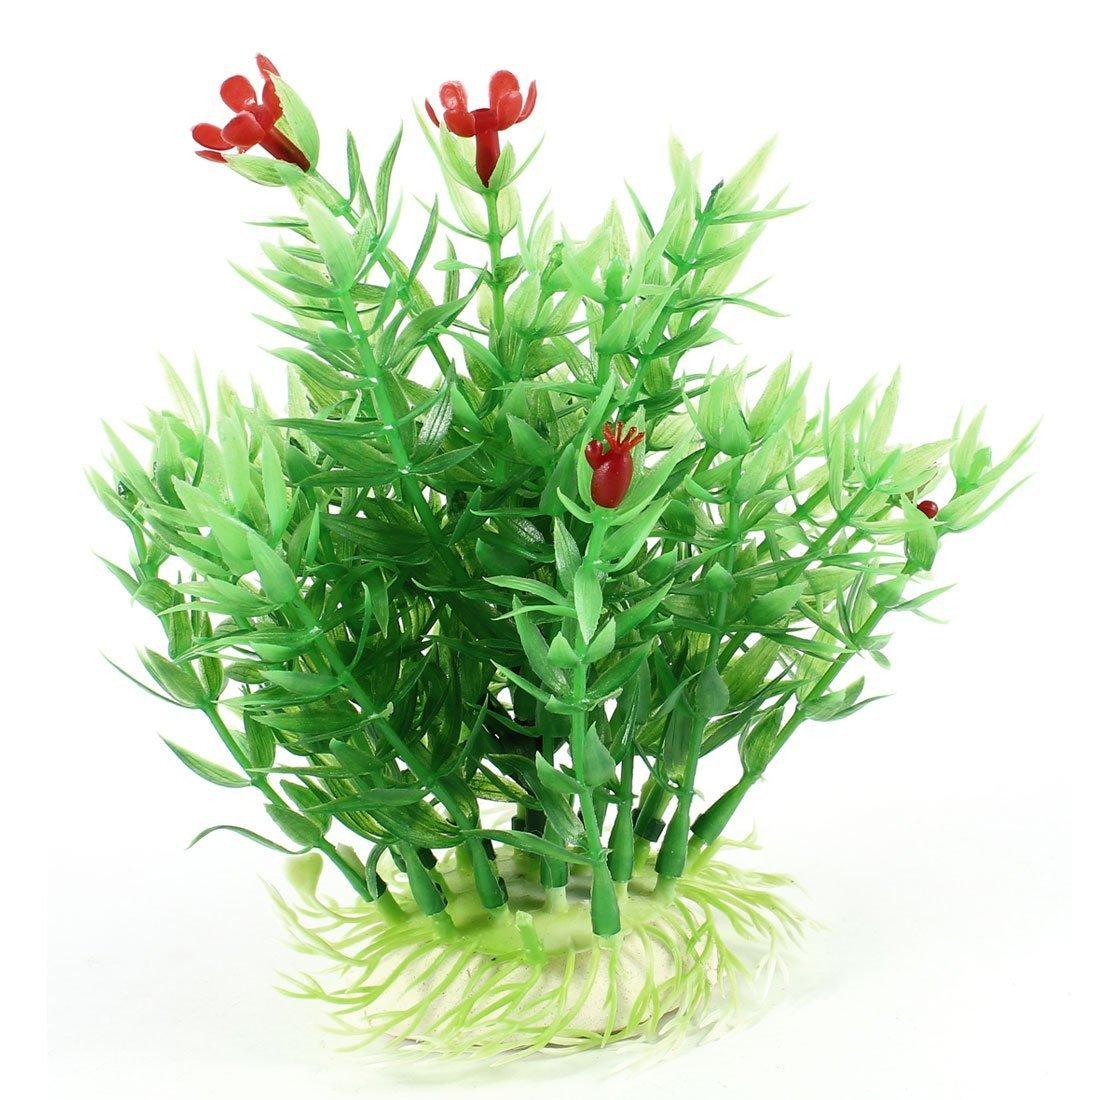 1Pc Aquarium Green Leaves Red Flowers Emulational Water Grass 5.7  High